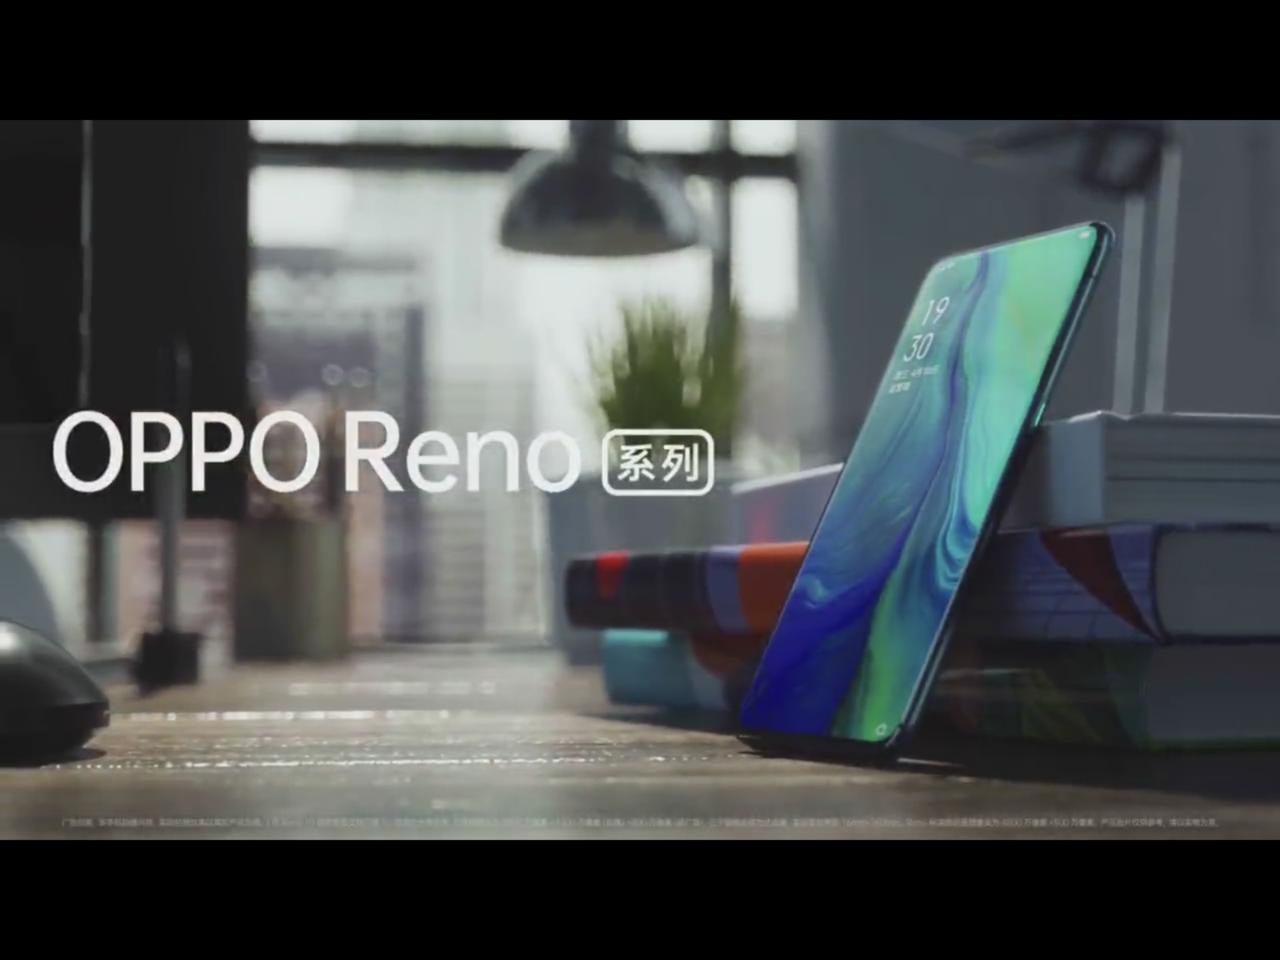 OPPO Reno系列包括標準版與10倍變焦版。圖/摘自發表會